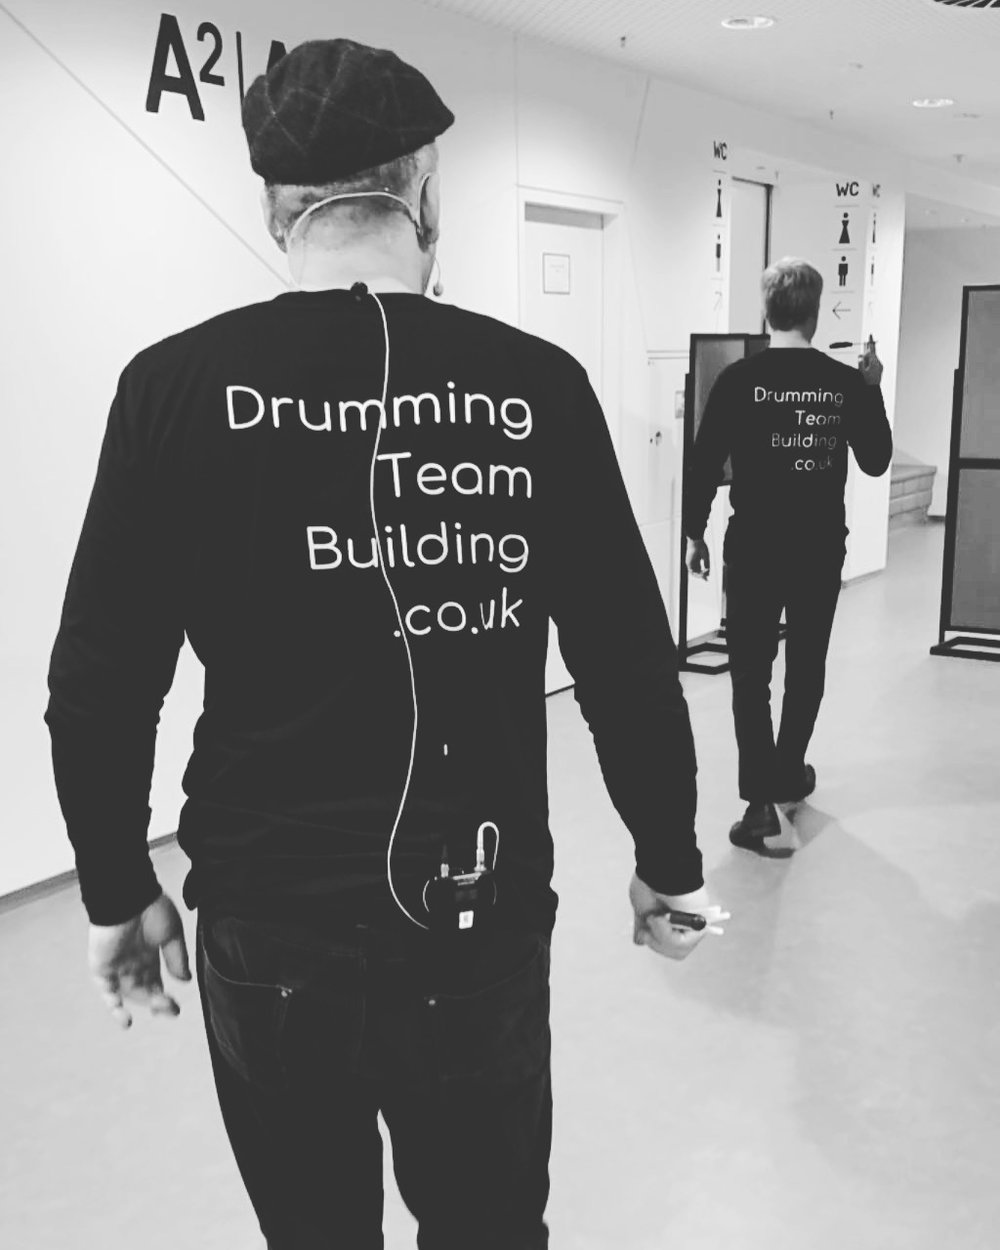 team building london uk